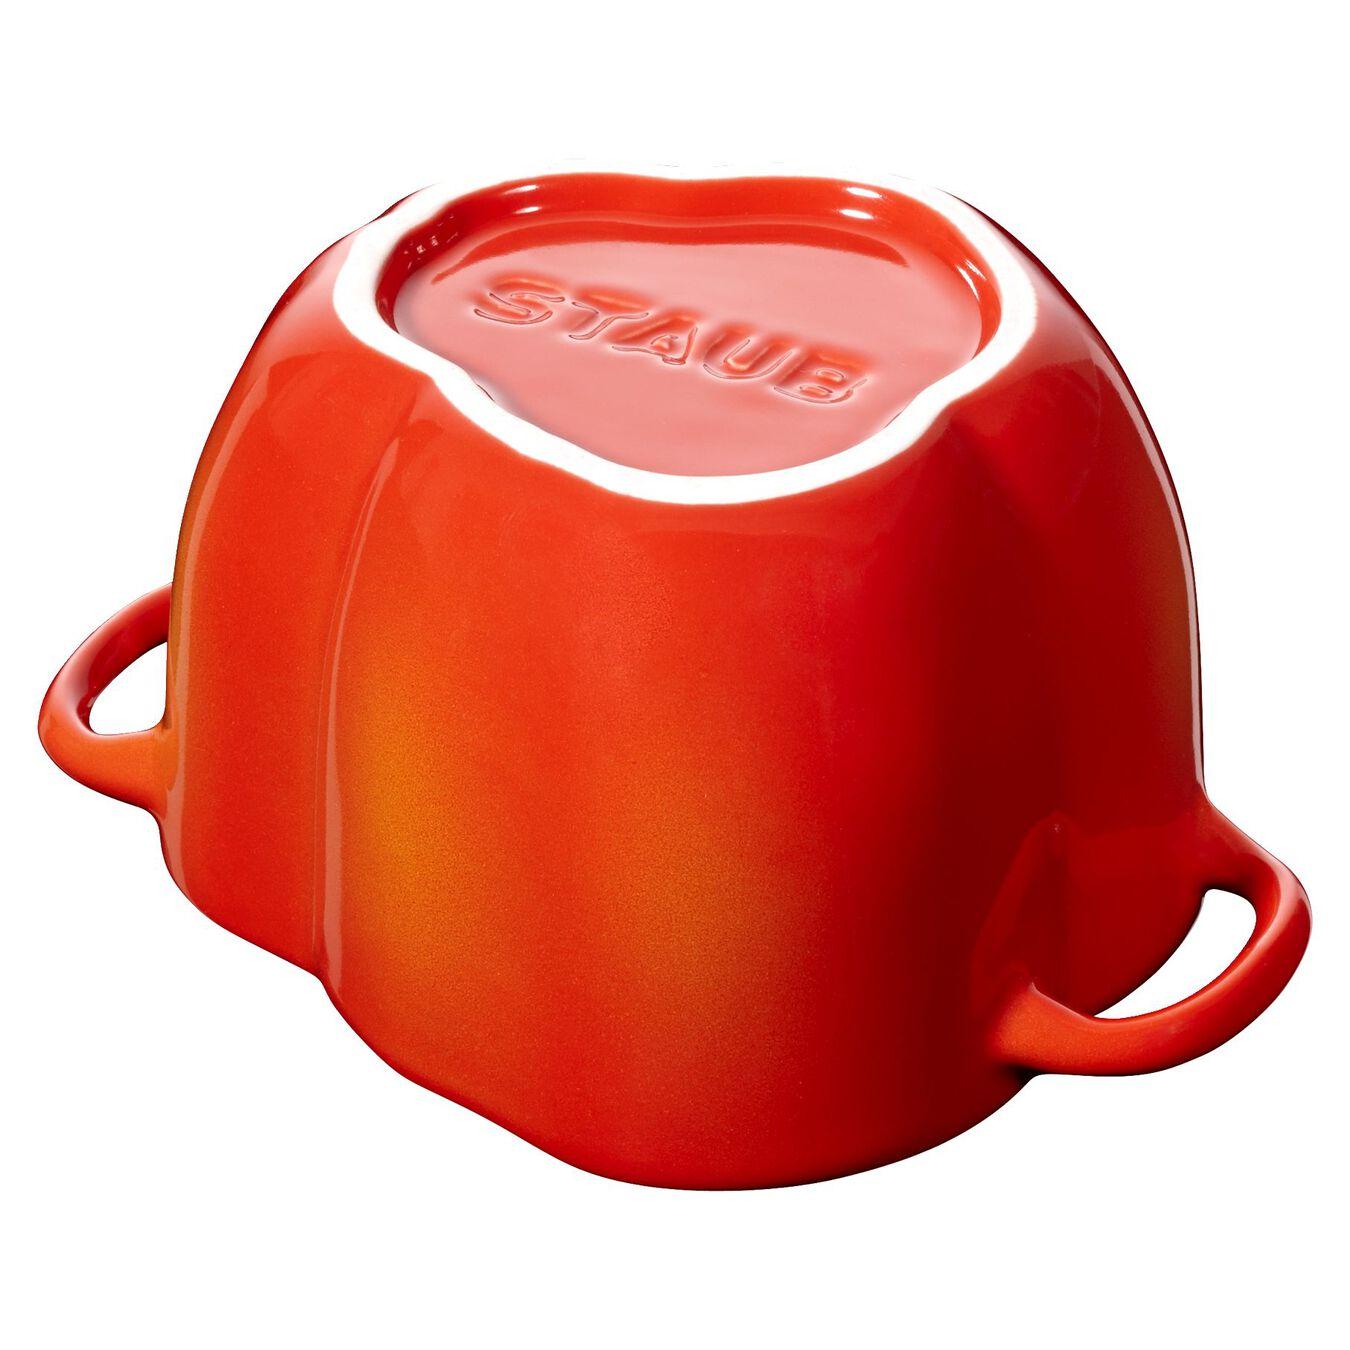 Cocotte 12 cm, pepper, Orange-Red, Céramique,,large 6